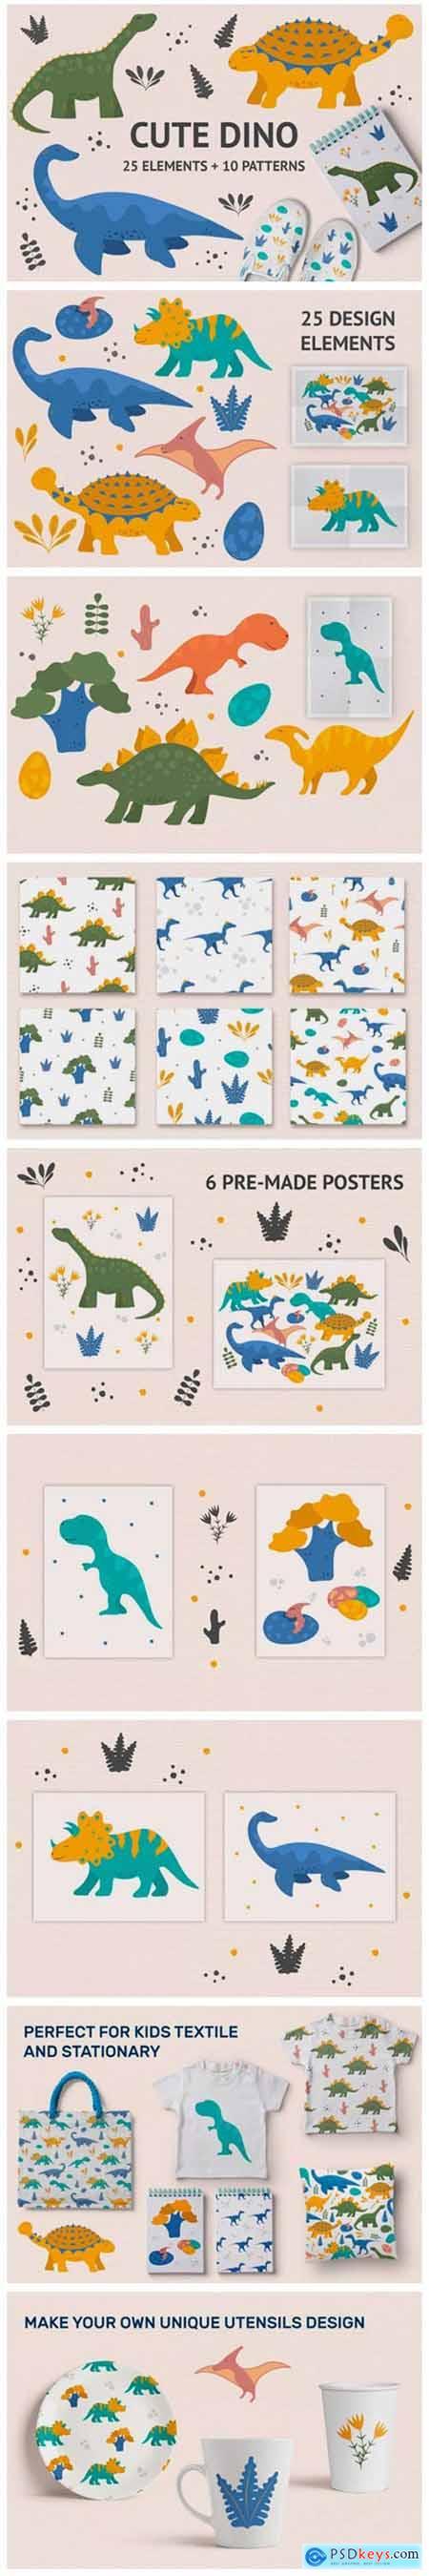 Cute Dino Illustrations 2661942